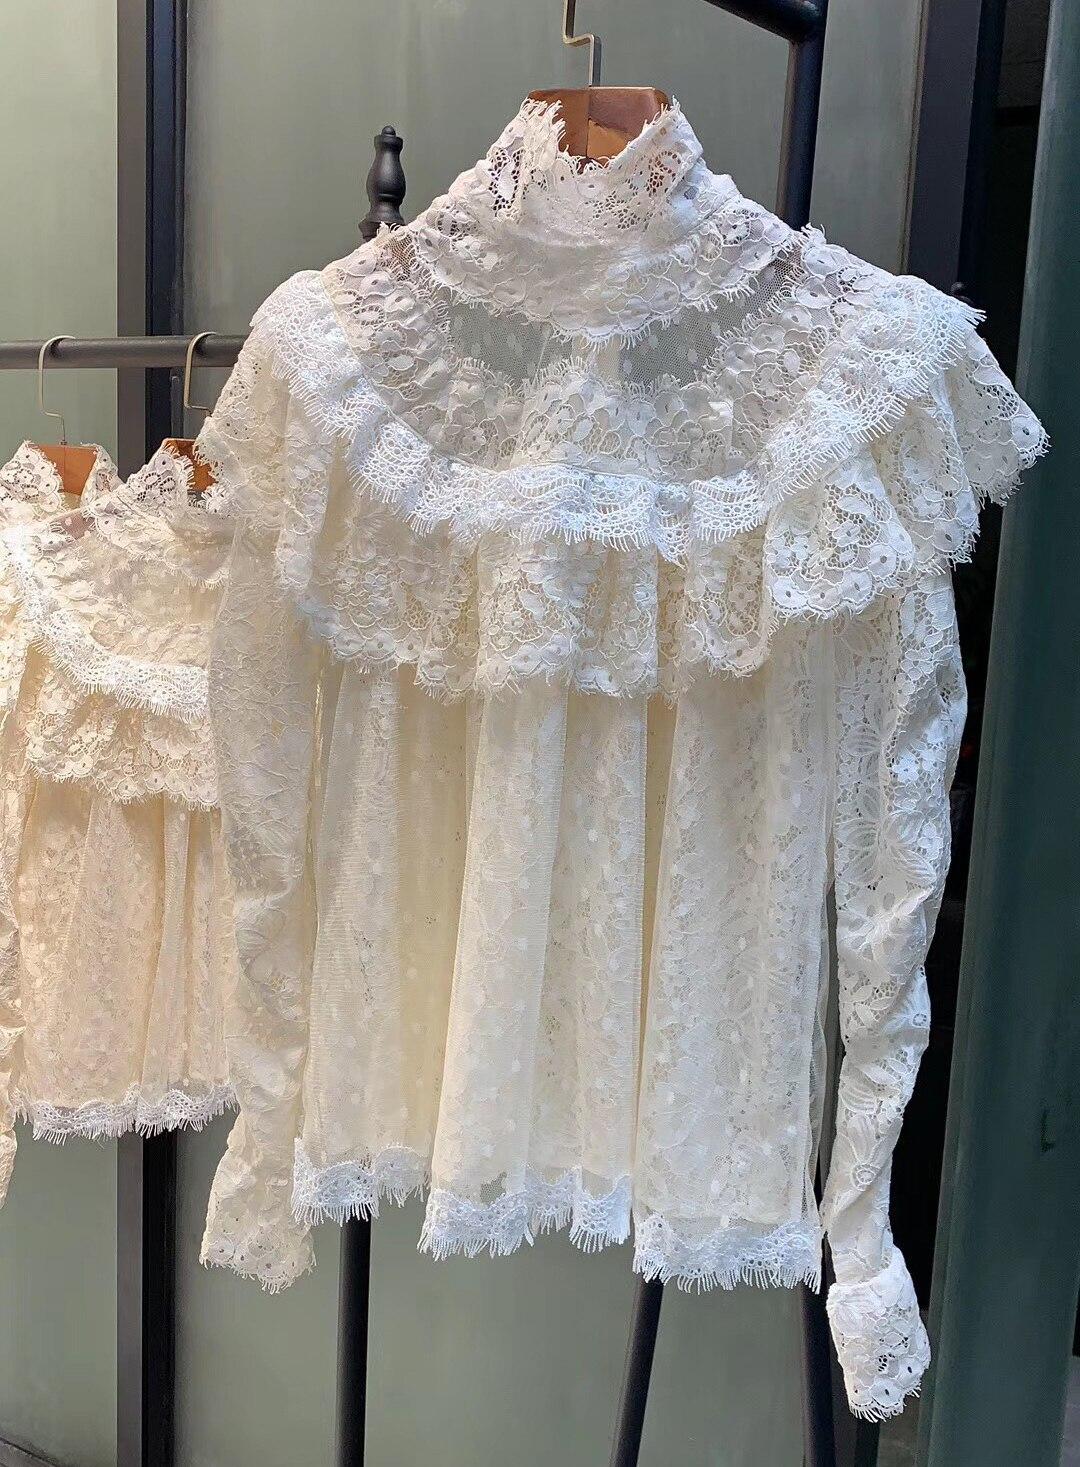 Women Fashion Christmas Tree Elk Letter Print Short Sleeves O-Neck Short Sweatshirt T-Shirt Blouse Tops M, 24GN